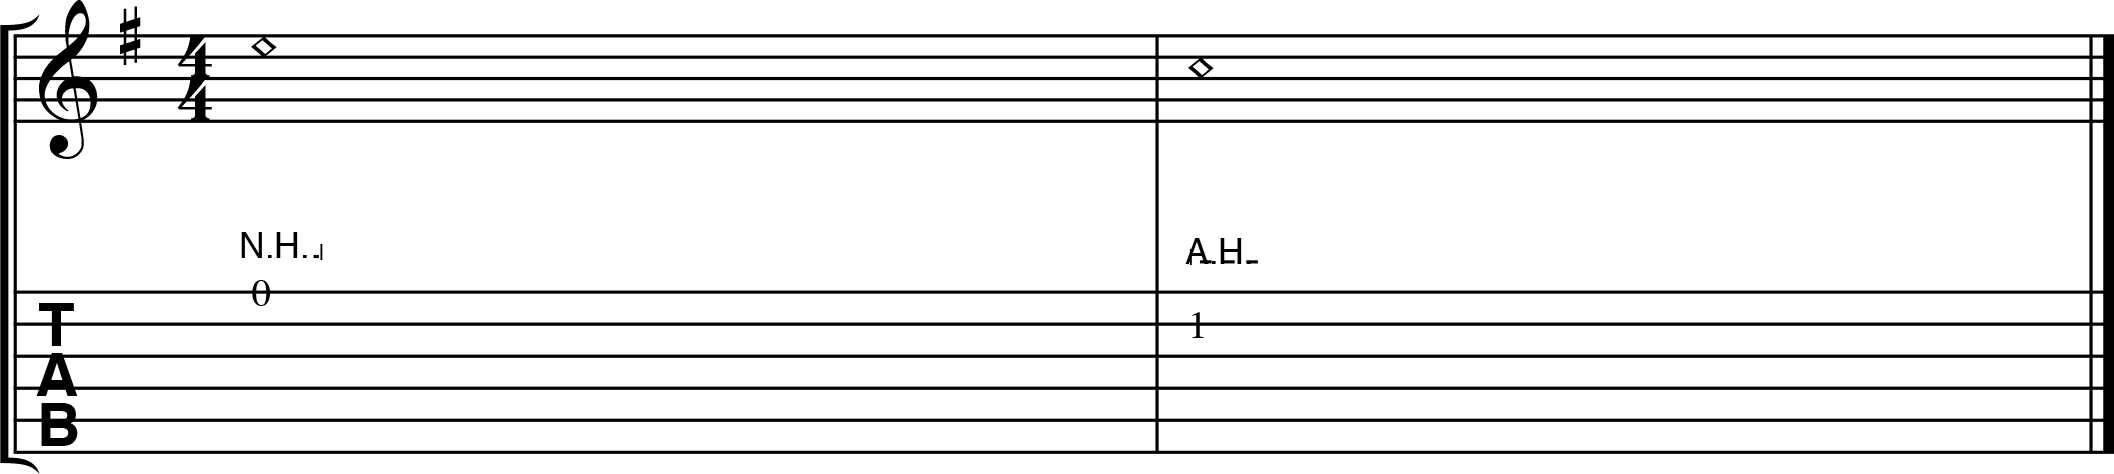 Artificial harmonics notation.